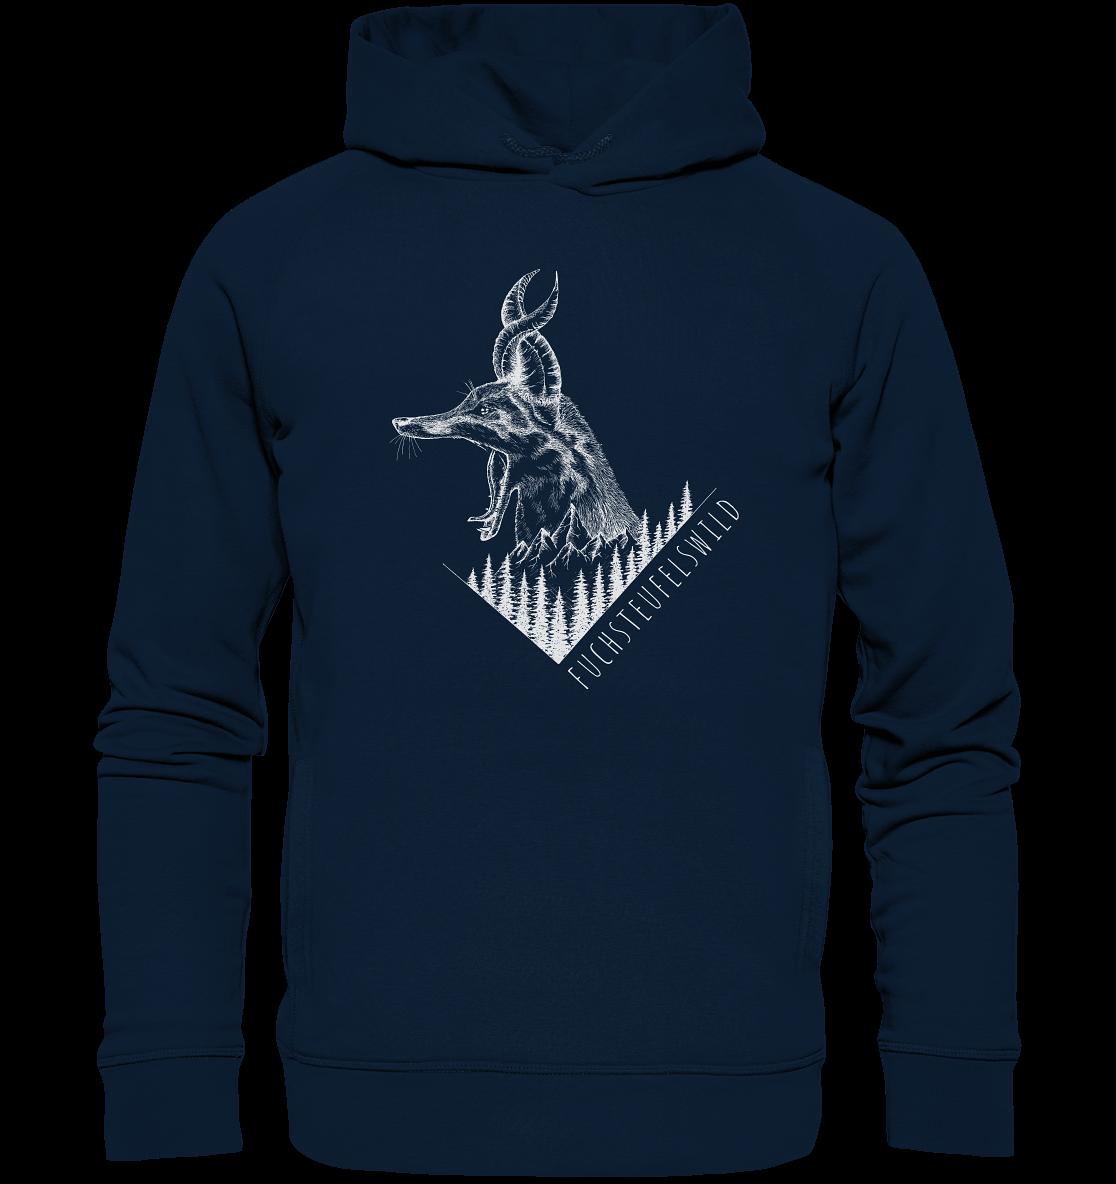 front-organic-fashion-hoodie-0e2035-1116x-3.png